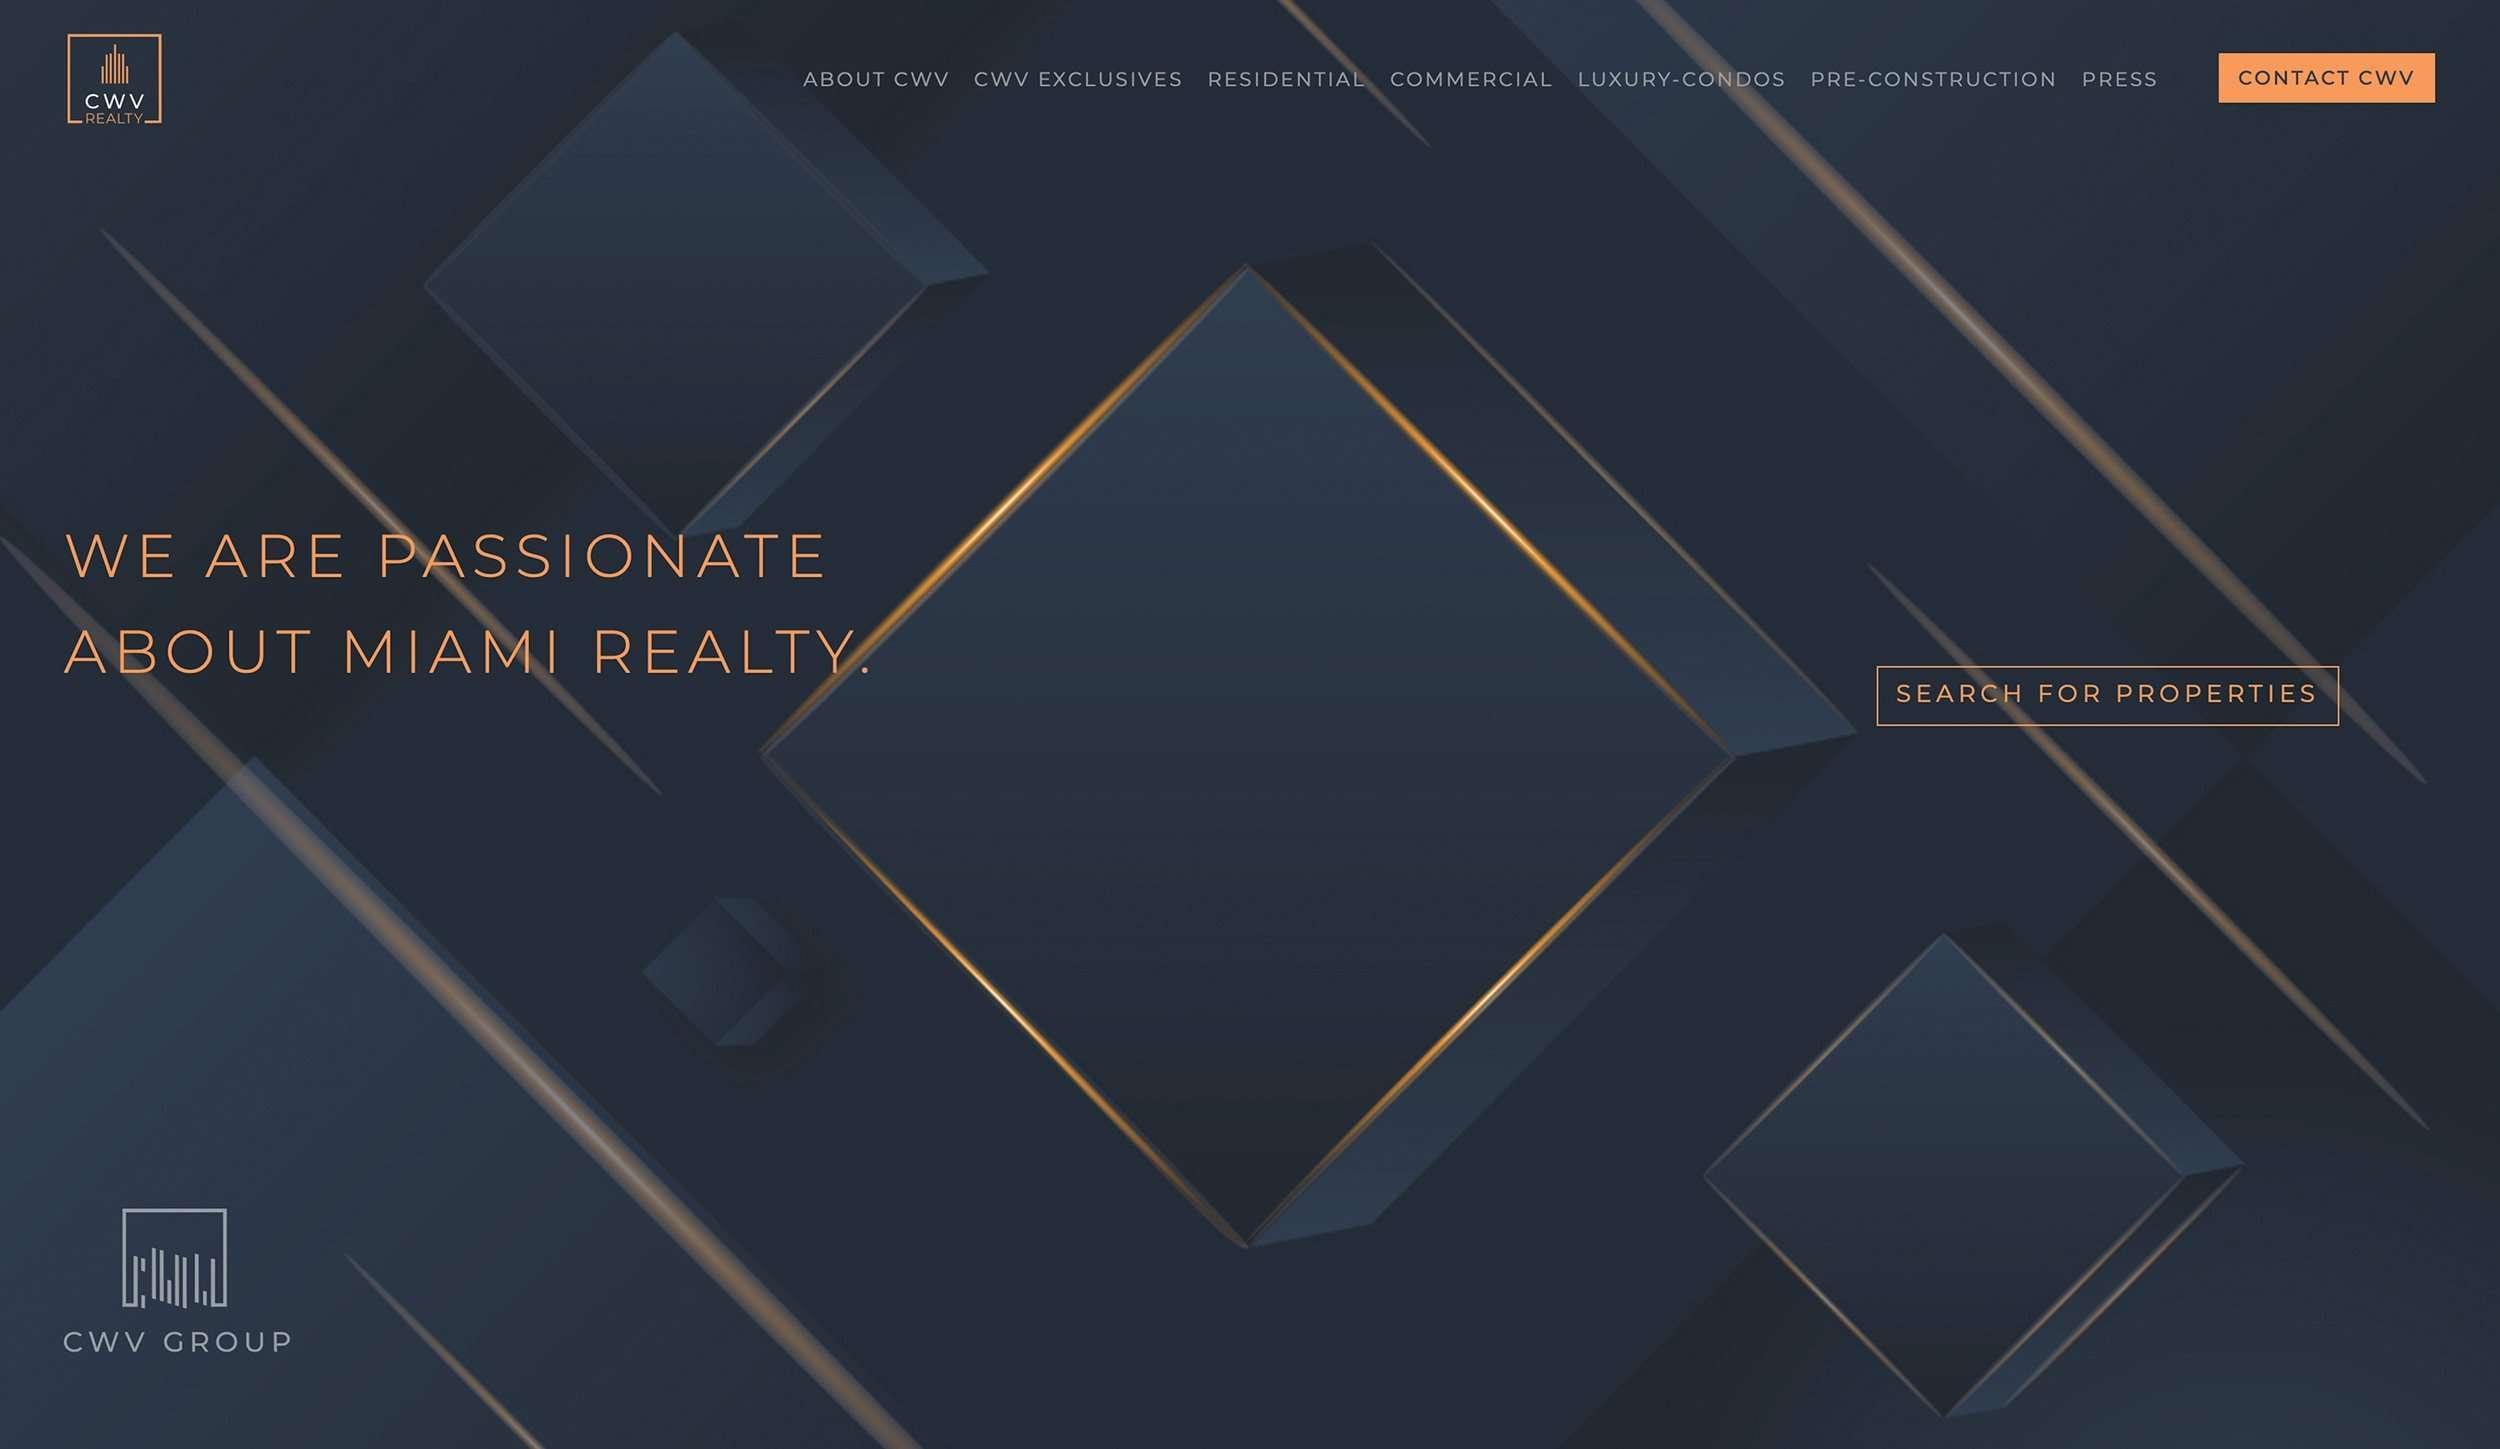 cwv-group-miami-usa-estados-unidos-real-estate-online-lab-lisbon-web-development-web-design-3